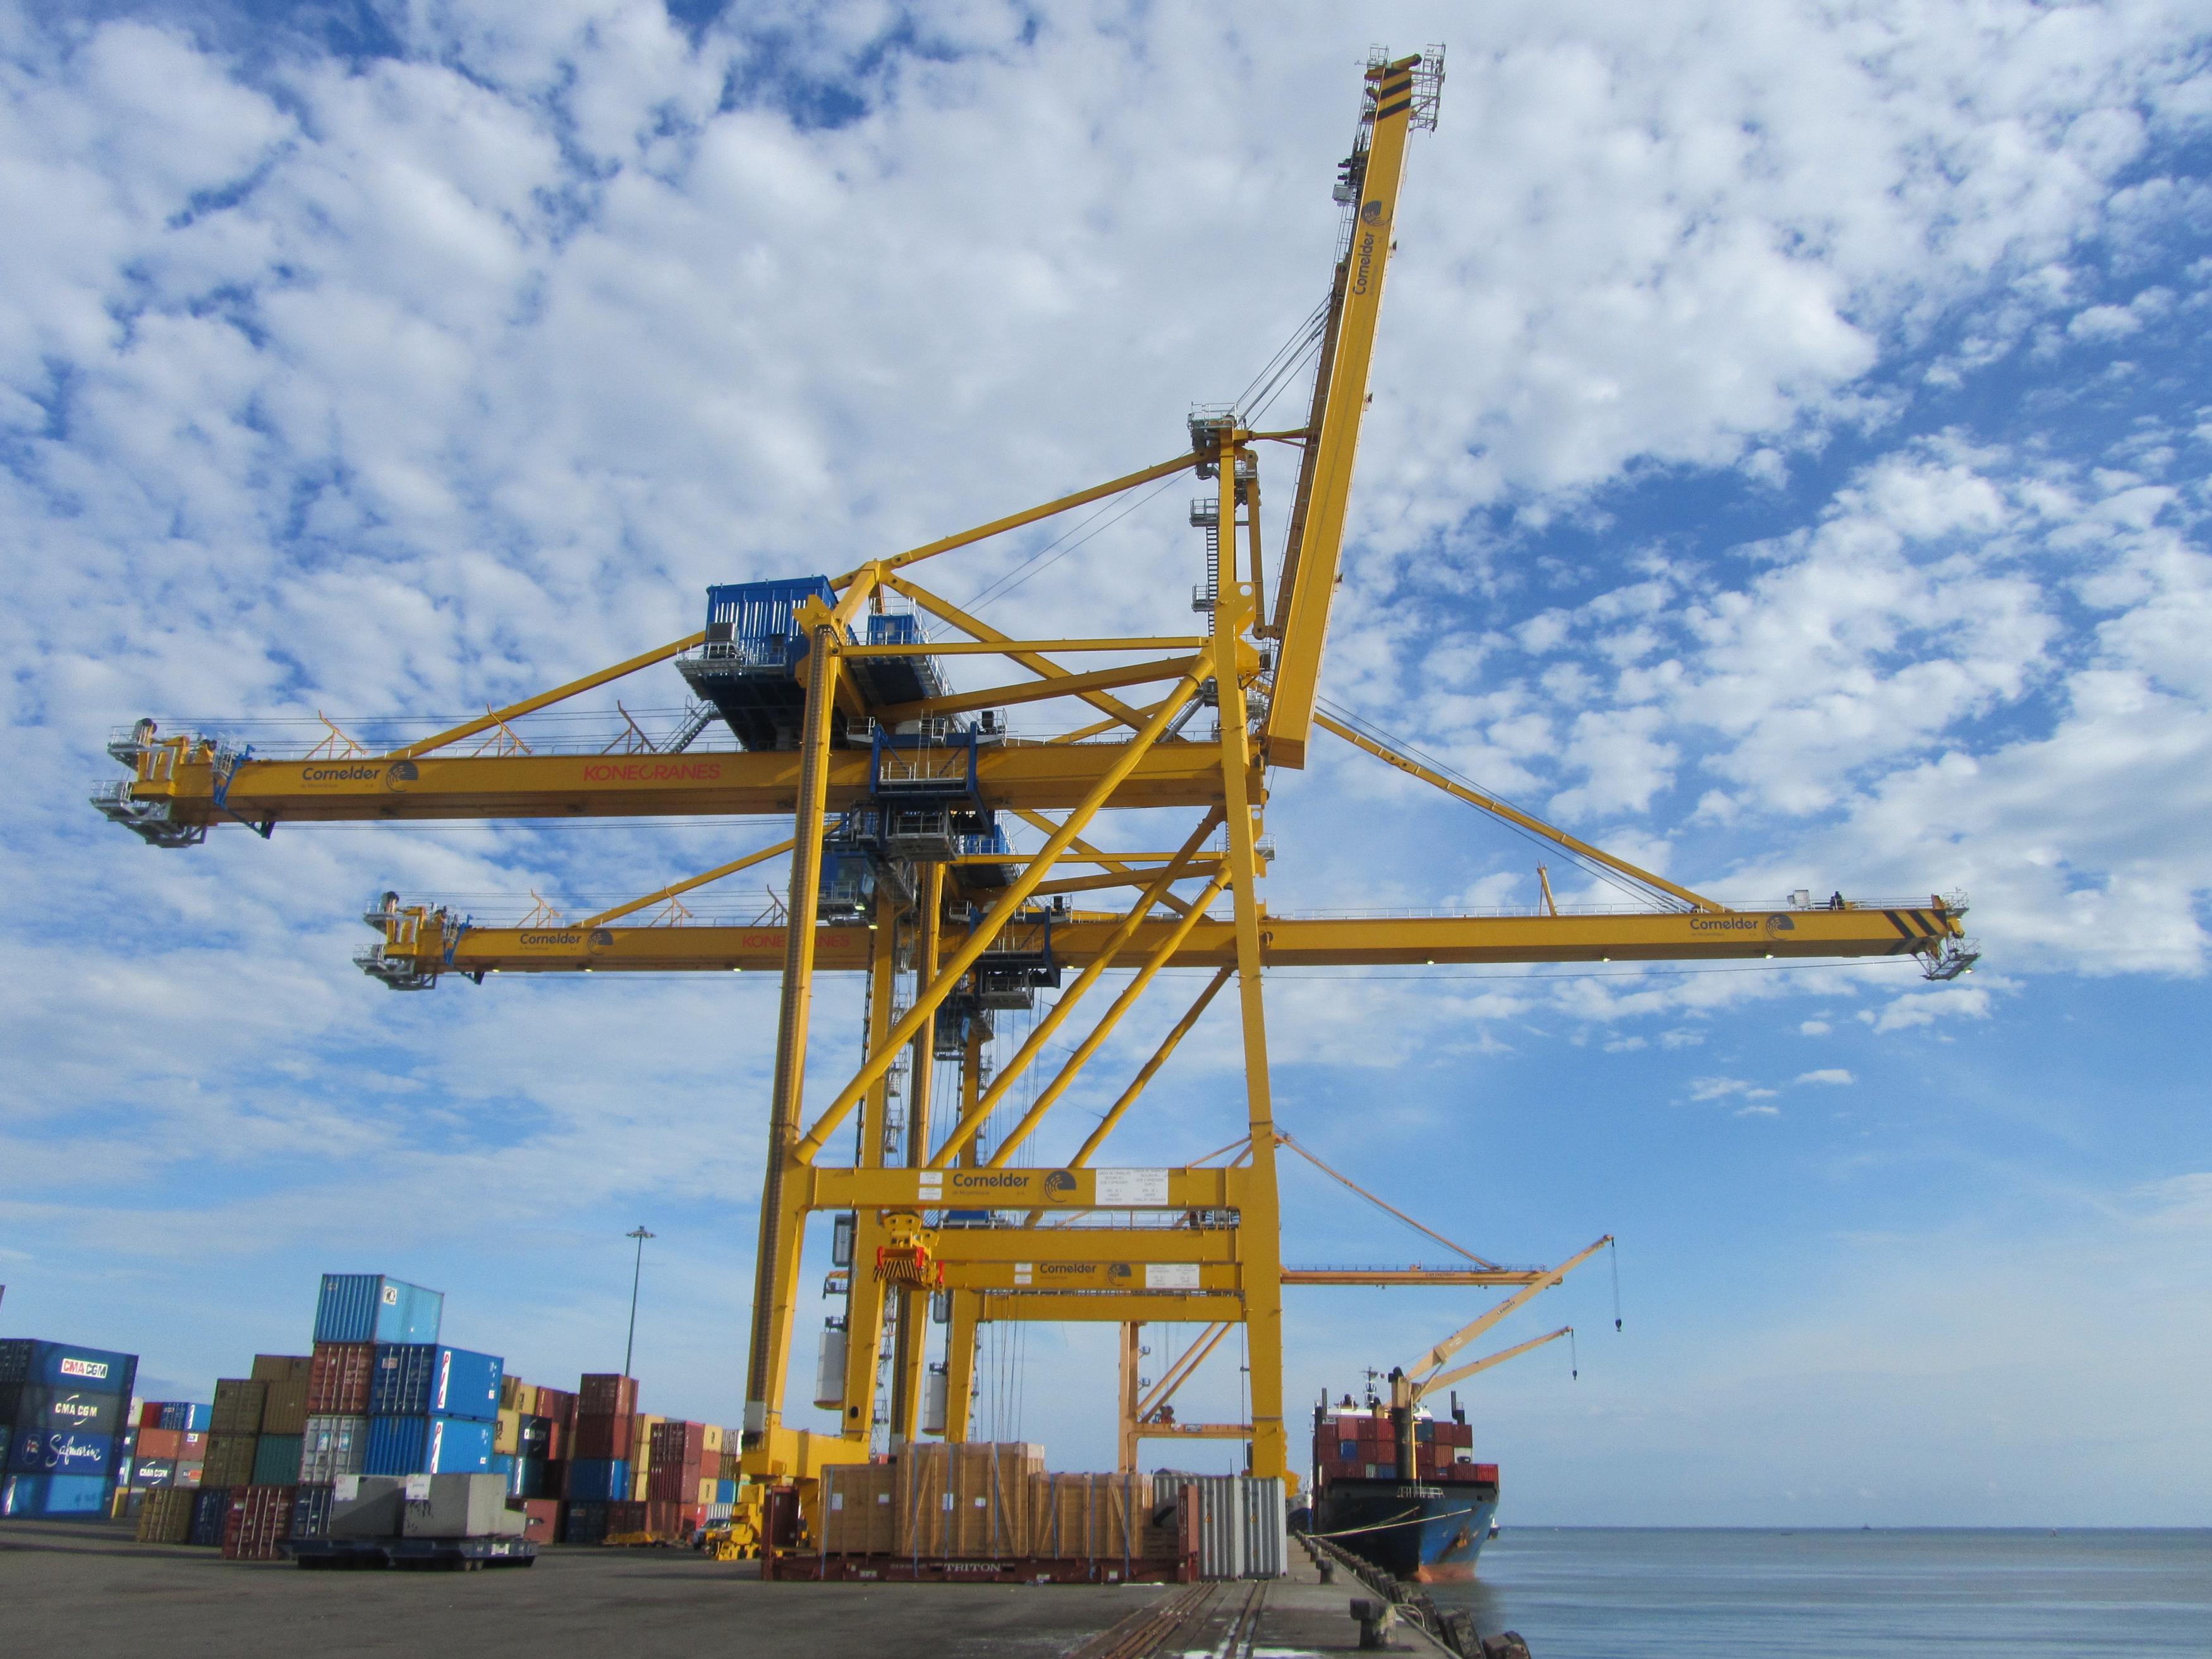 Konecranes Delivers Two Ship To Shore Cranes To Mozambique